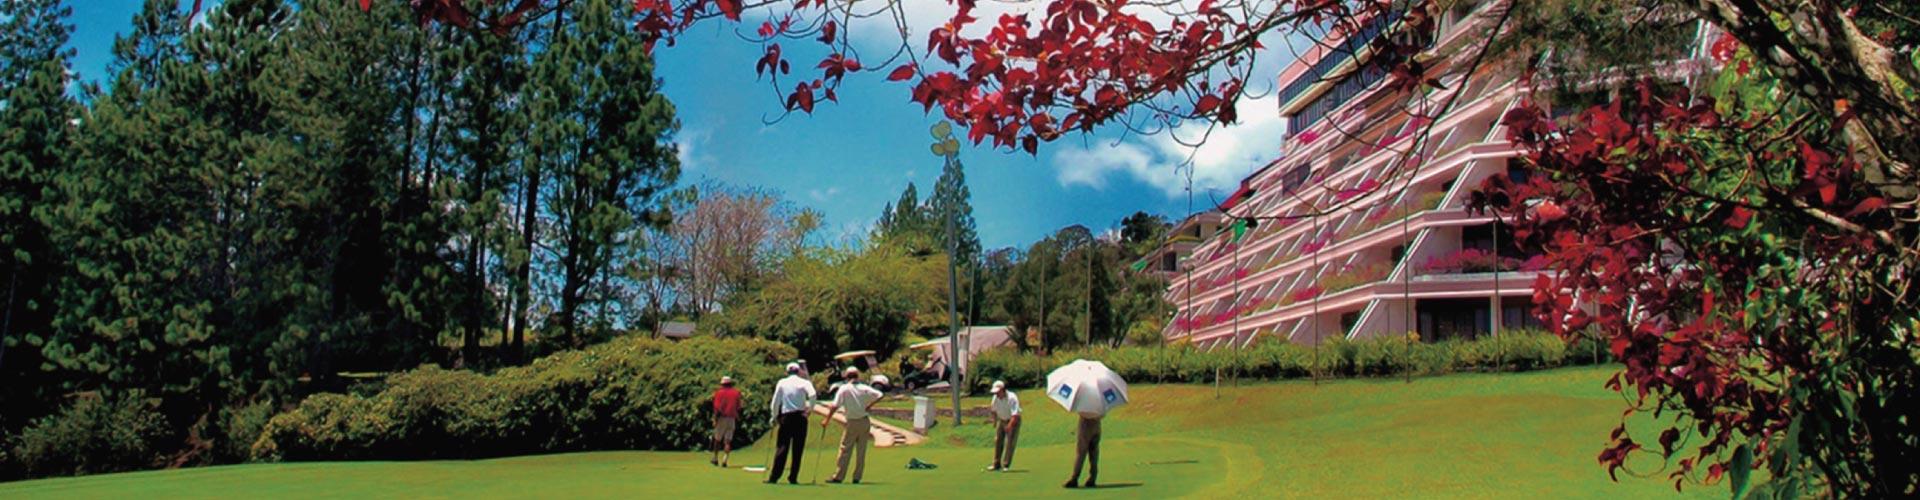 Golf In The Hills @ Resorts World Awana